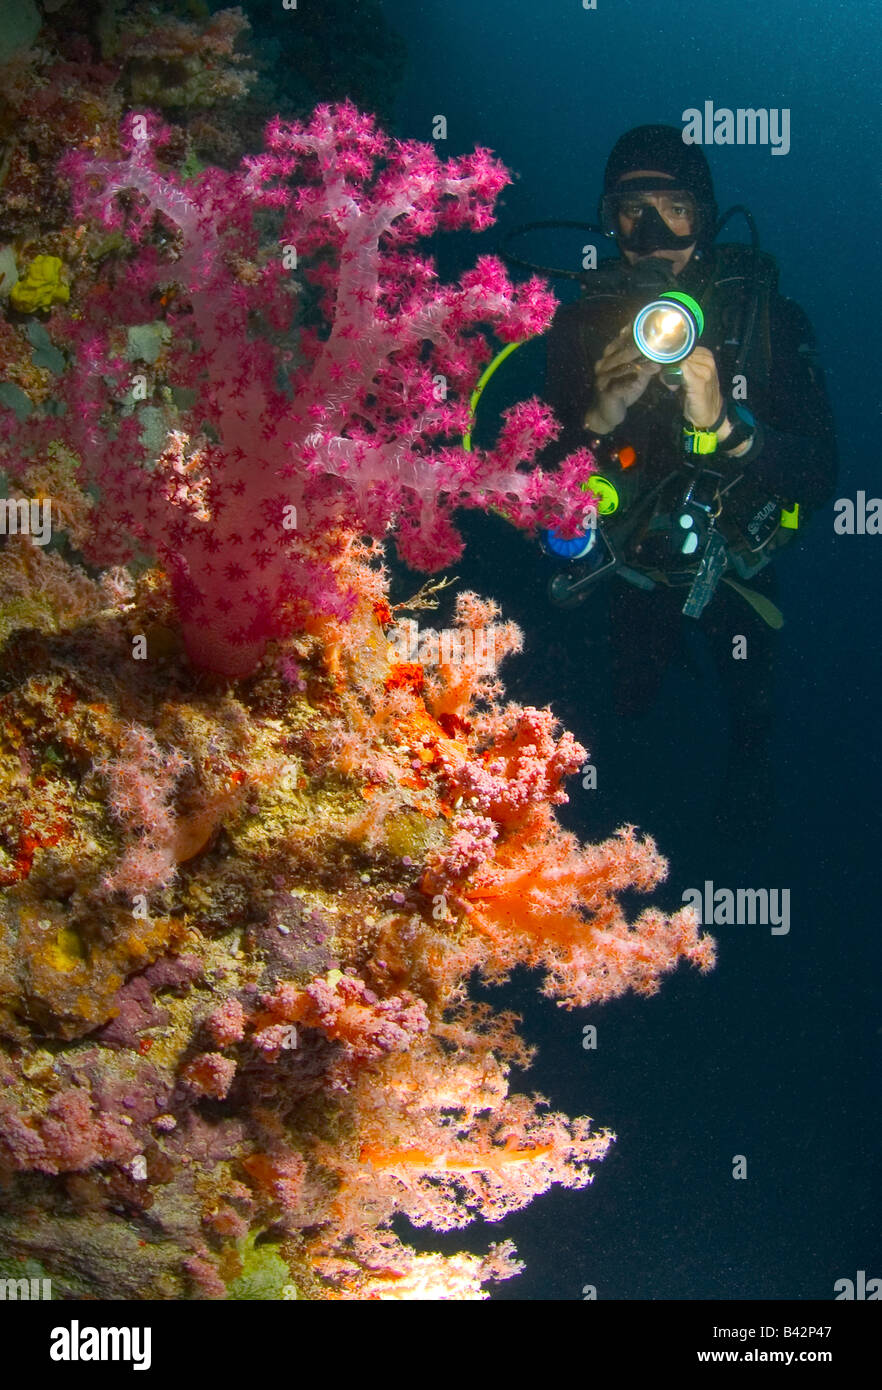 Night Diver and Soft Corals Caroline Islands Senyavin Islands Pacific Pohnpei Micronesia - Stock Image